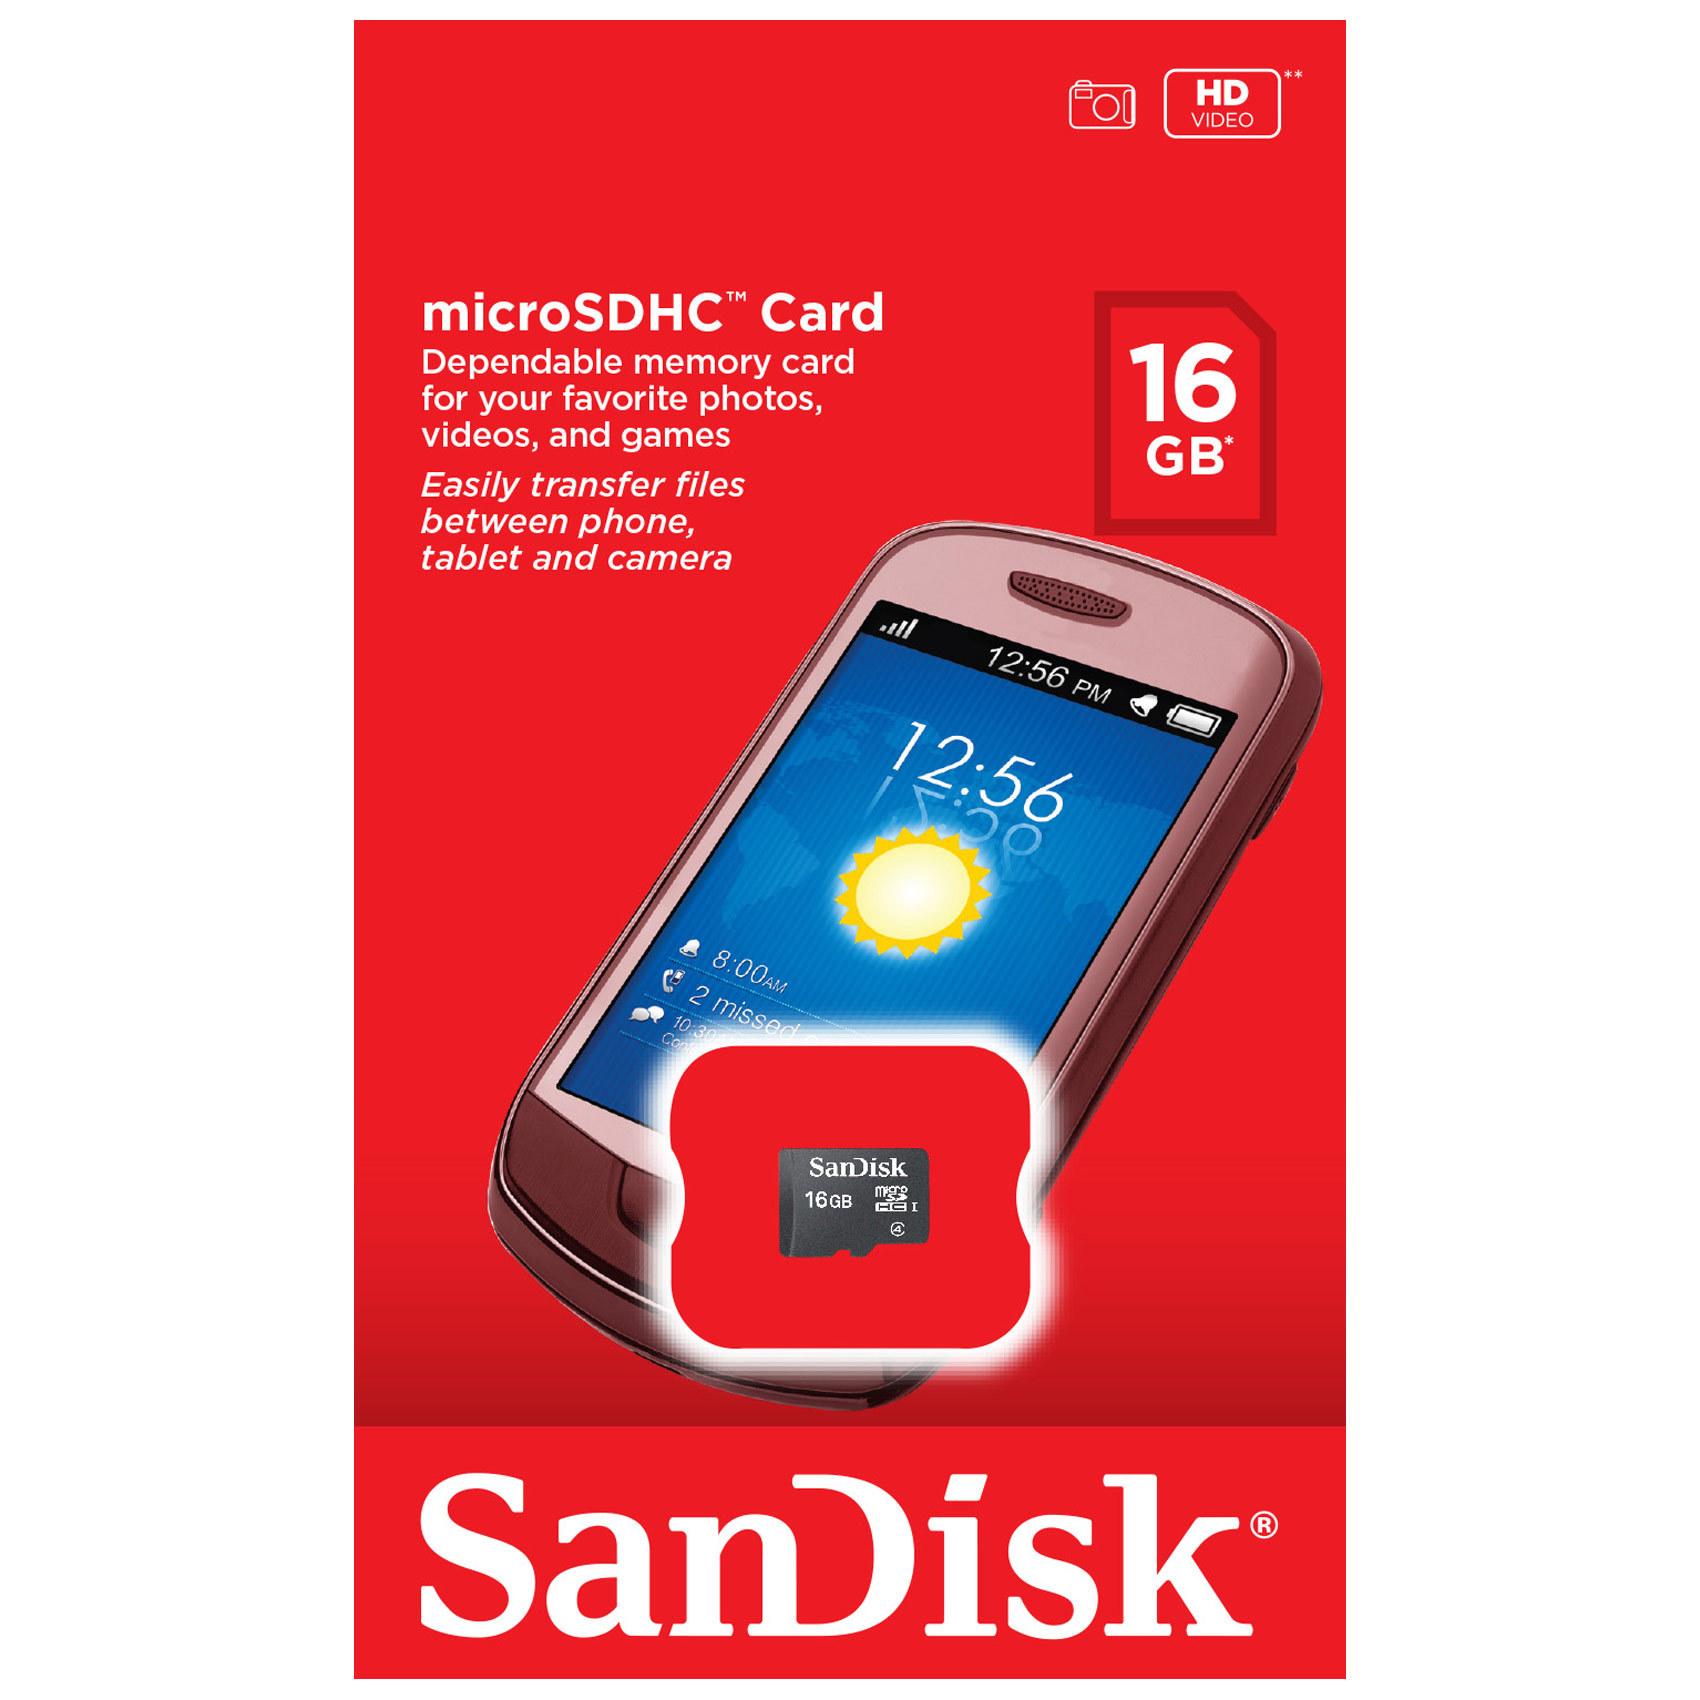 SANDISK MIC SD 16GB C4